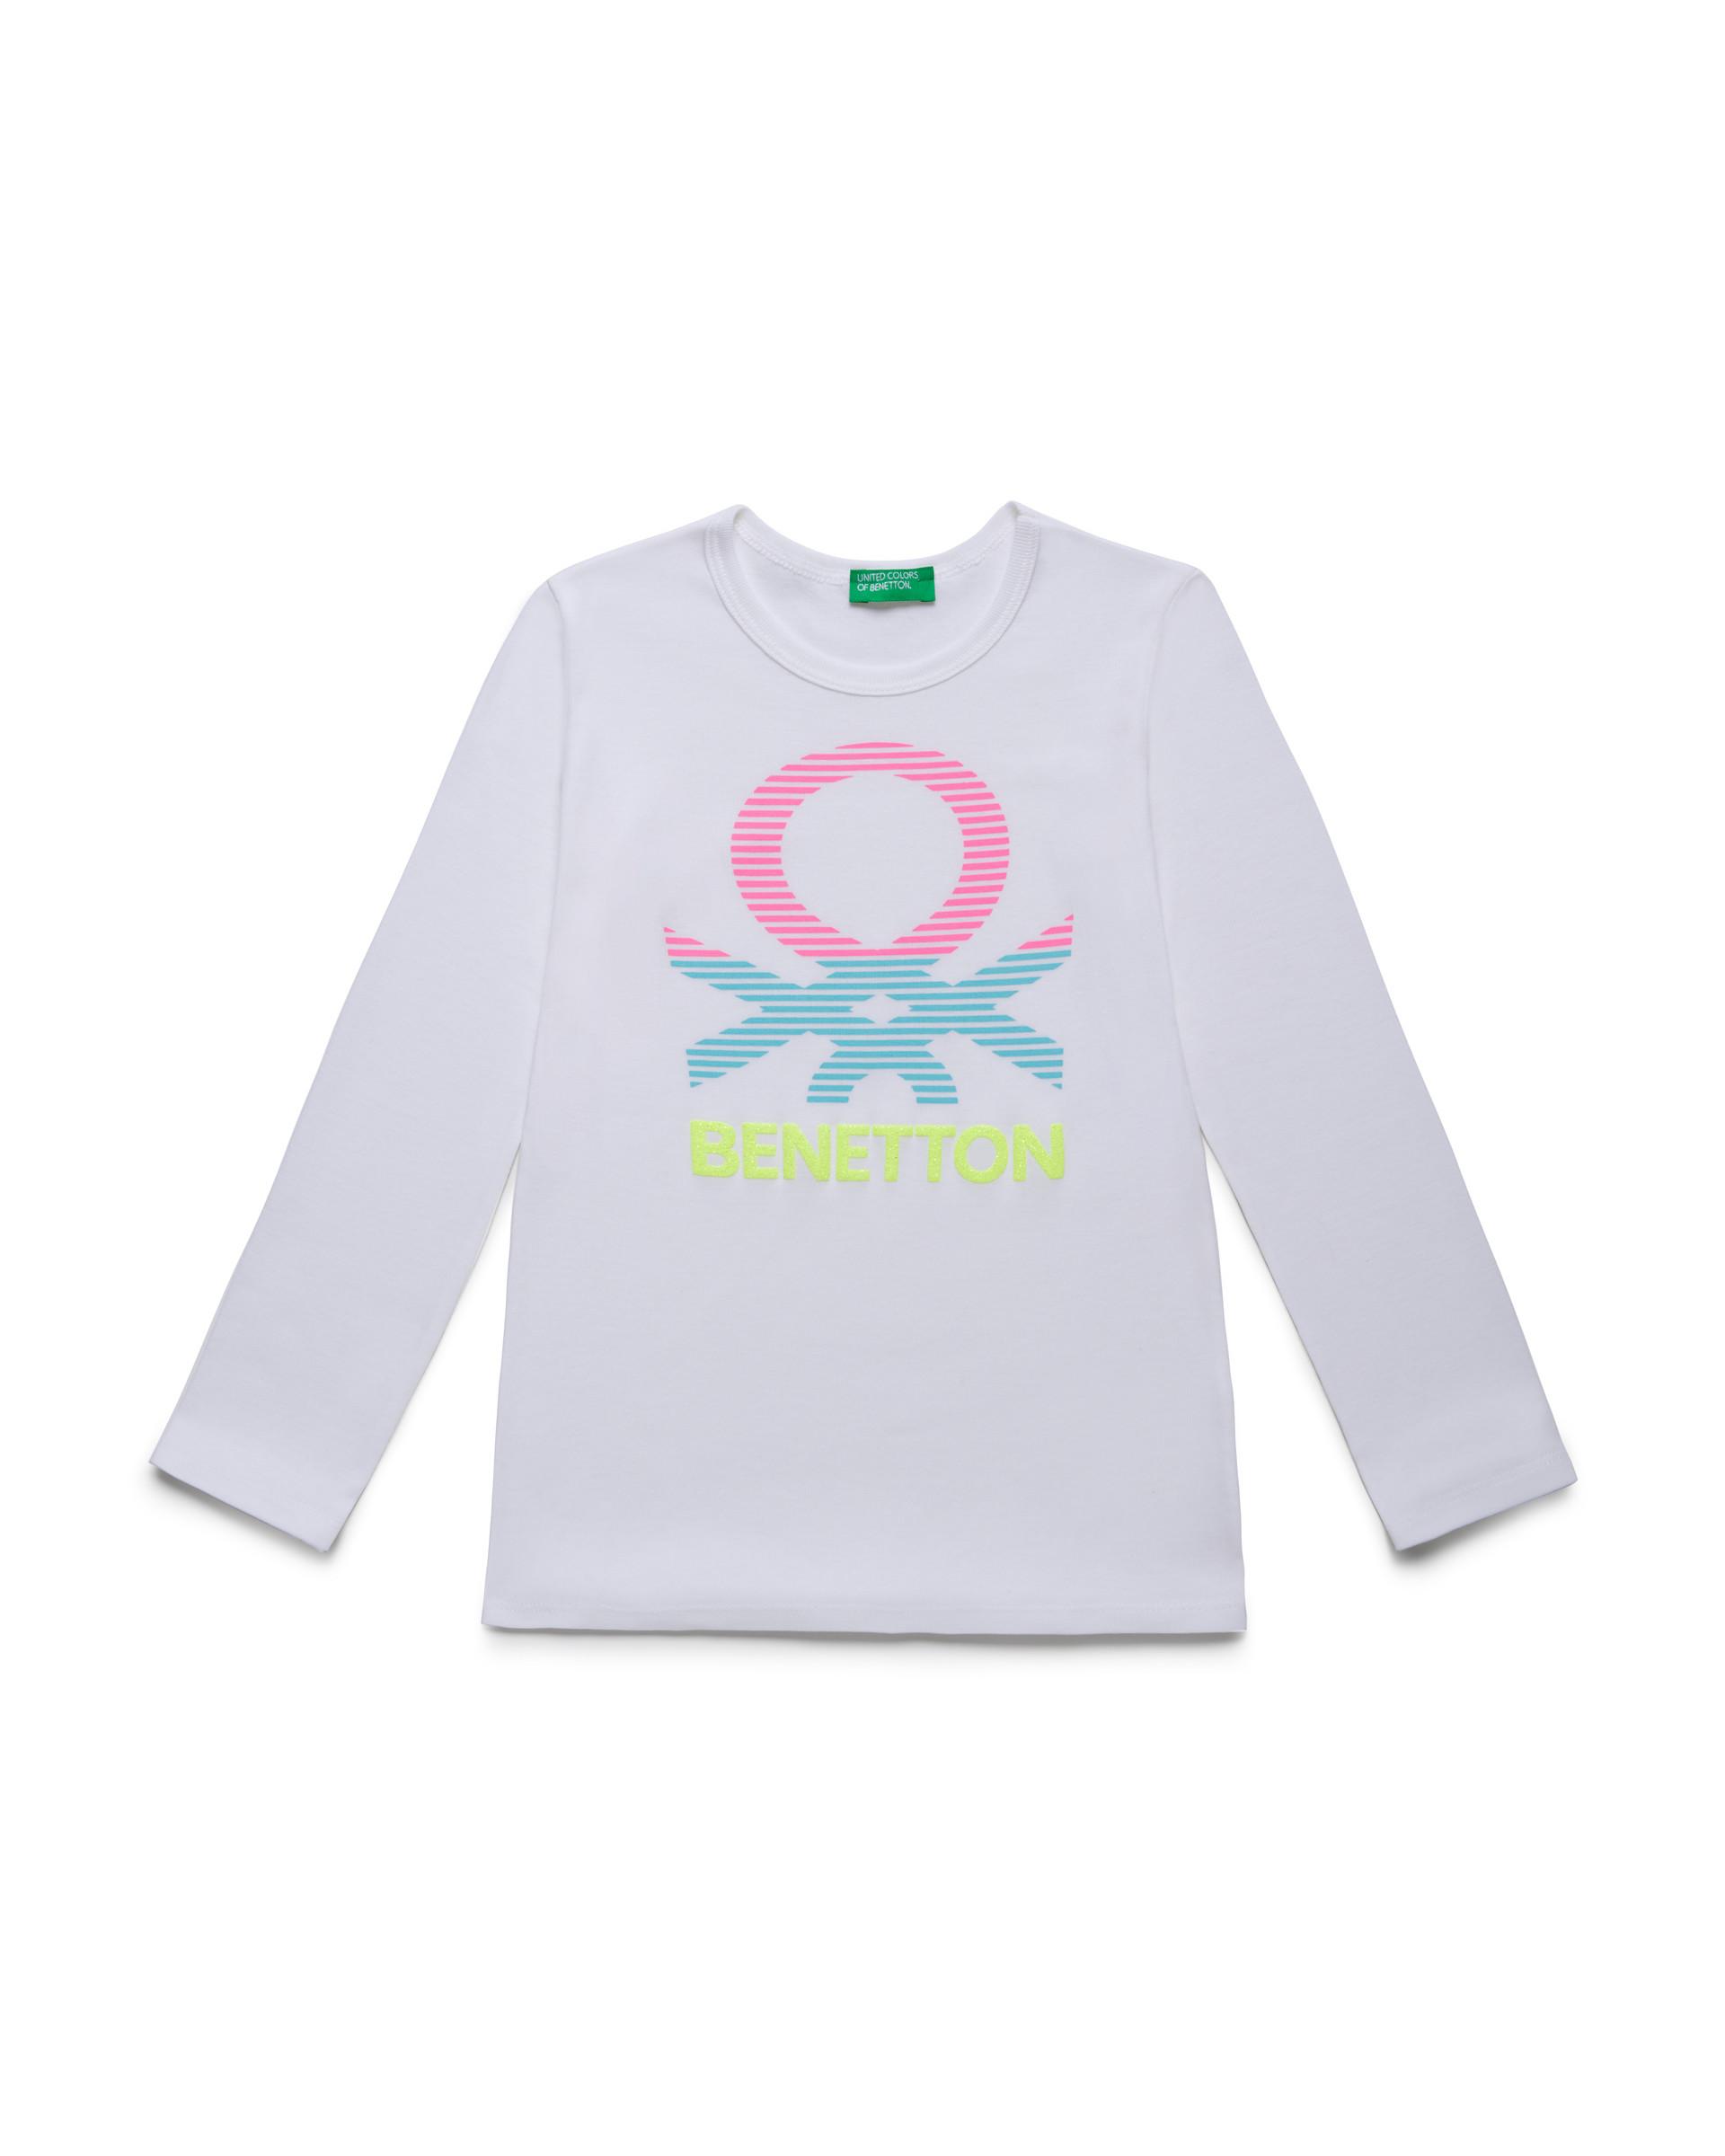 Купить 20P_3I9WC14J3_101, Футболка для девочек Benetton 3I9WC14J3_101 р-р 170, United Colors of Benetton, Футболки для девочек